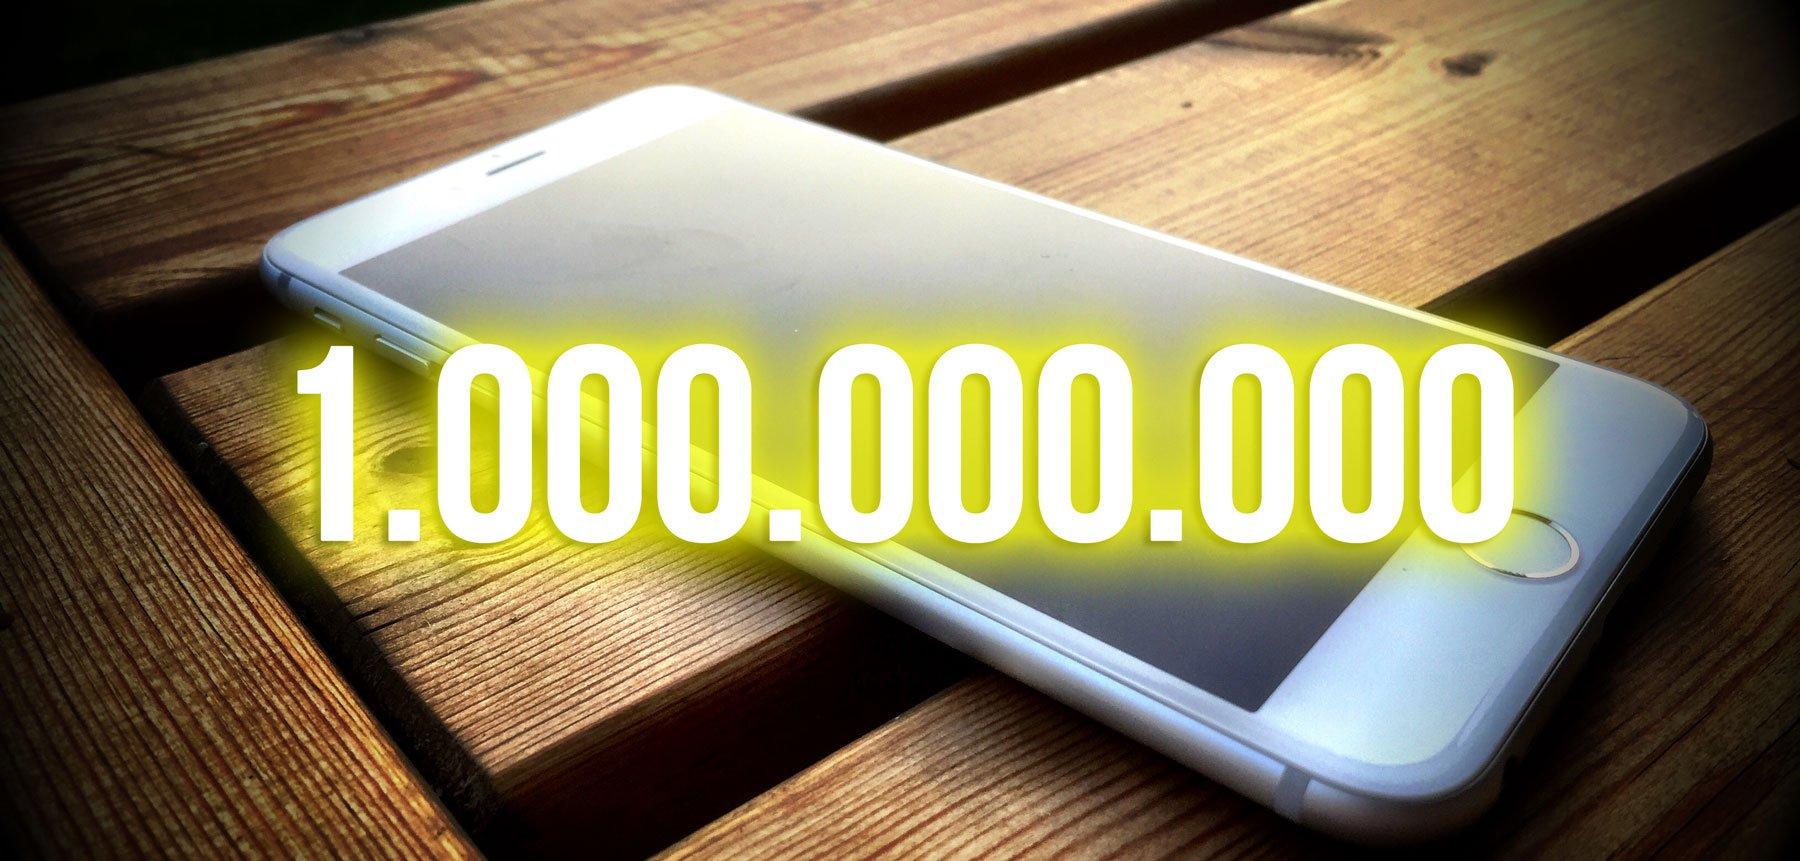 apple iphone 100000000000. iphone 1000000000 apple 100000000000